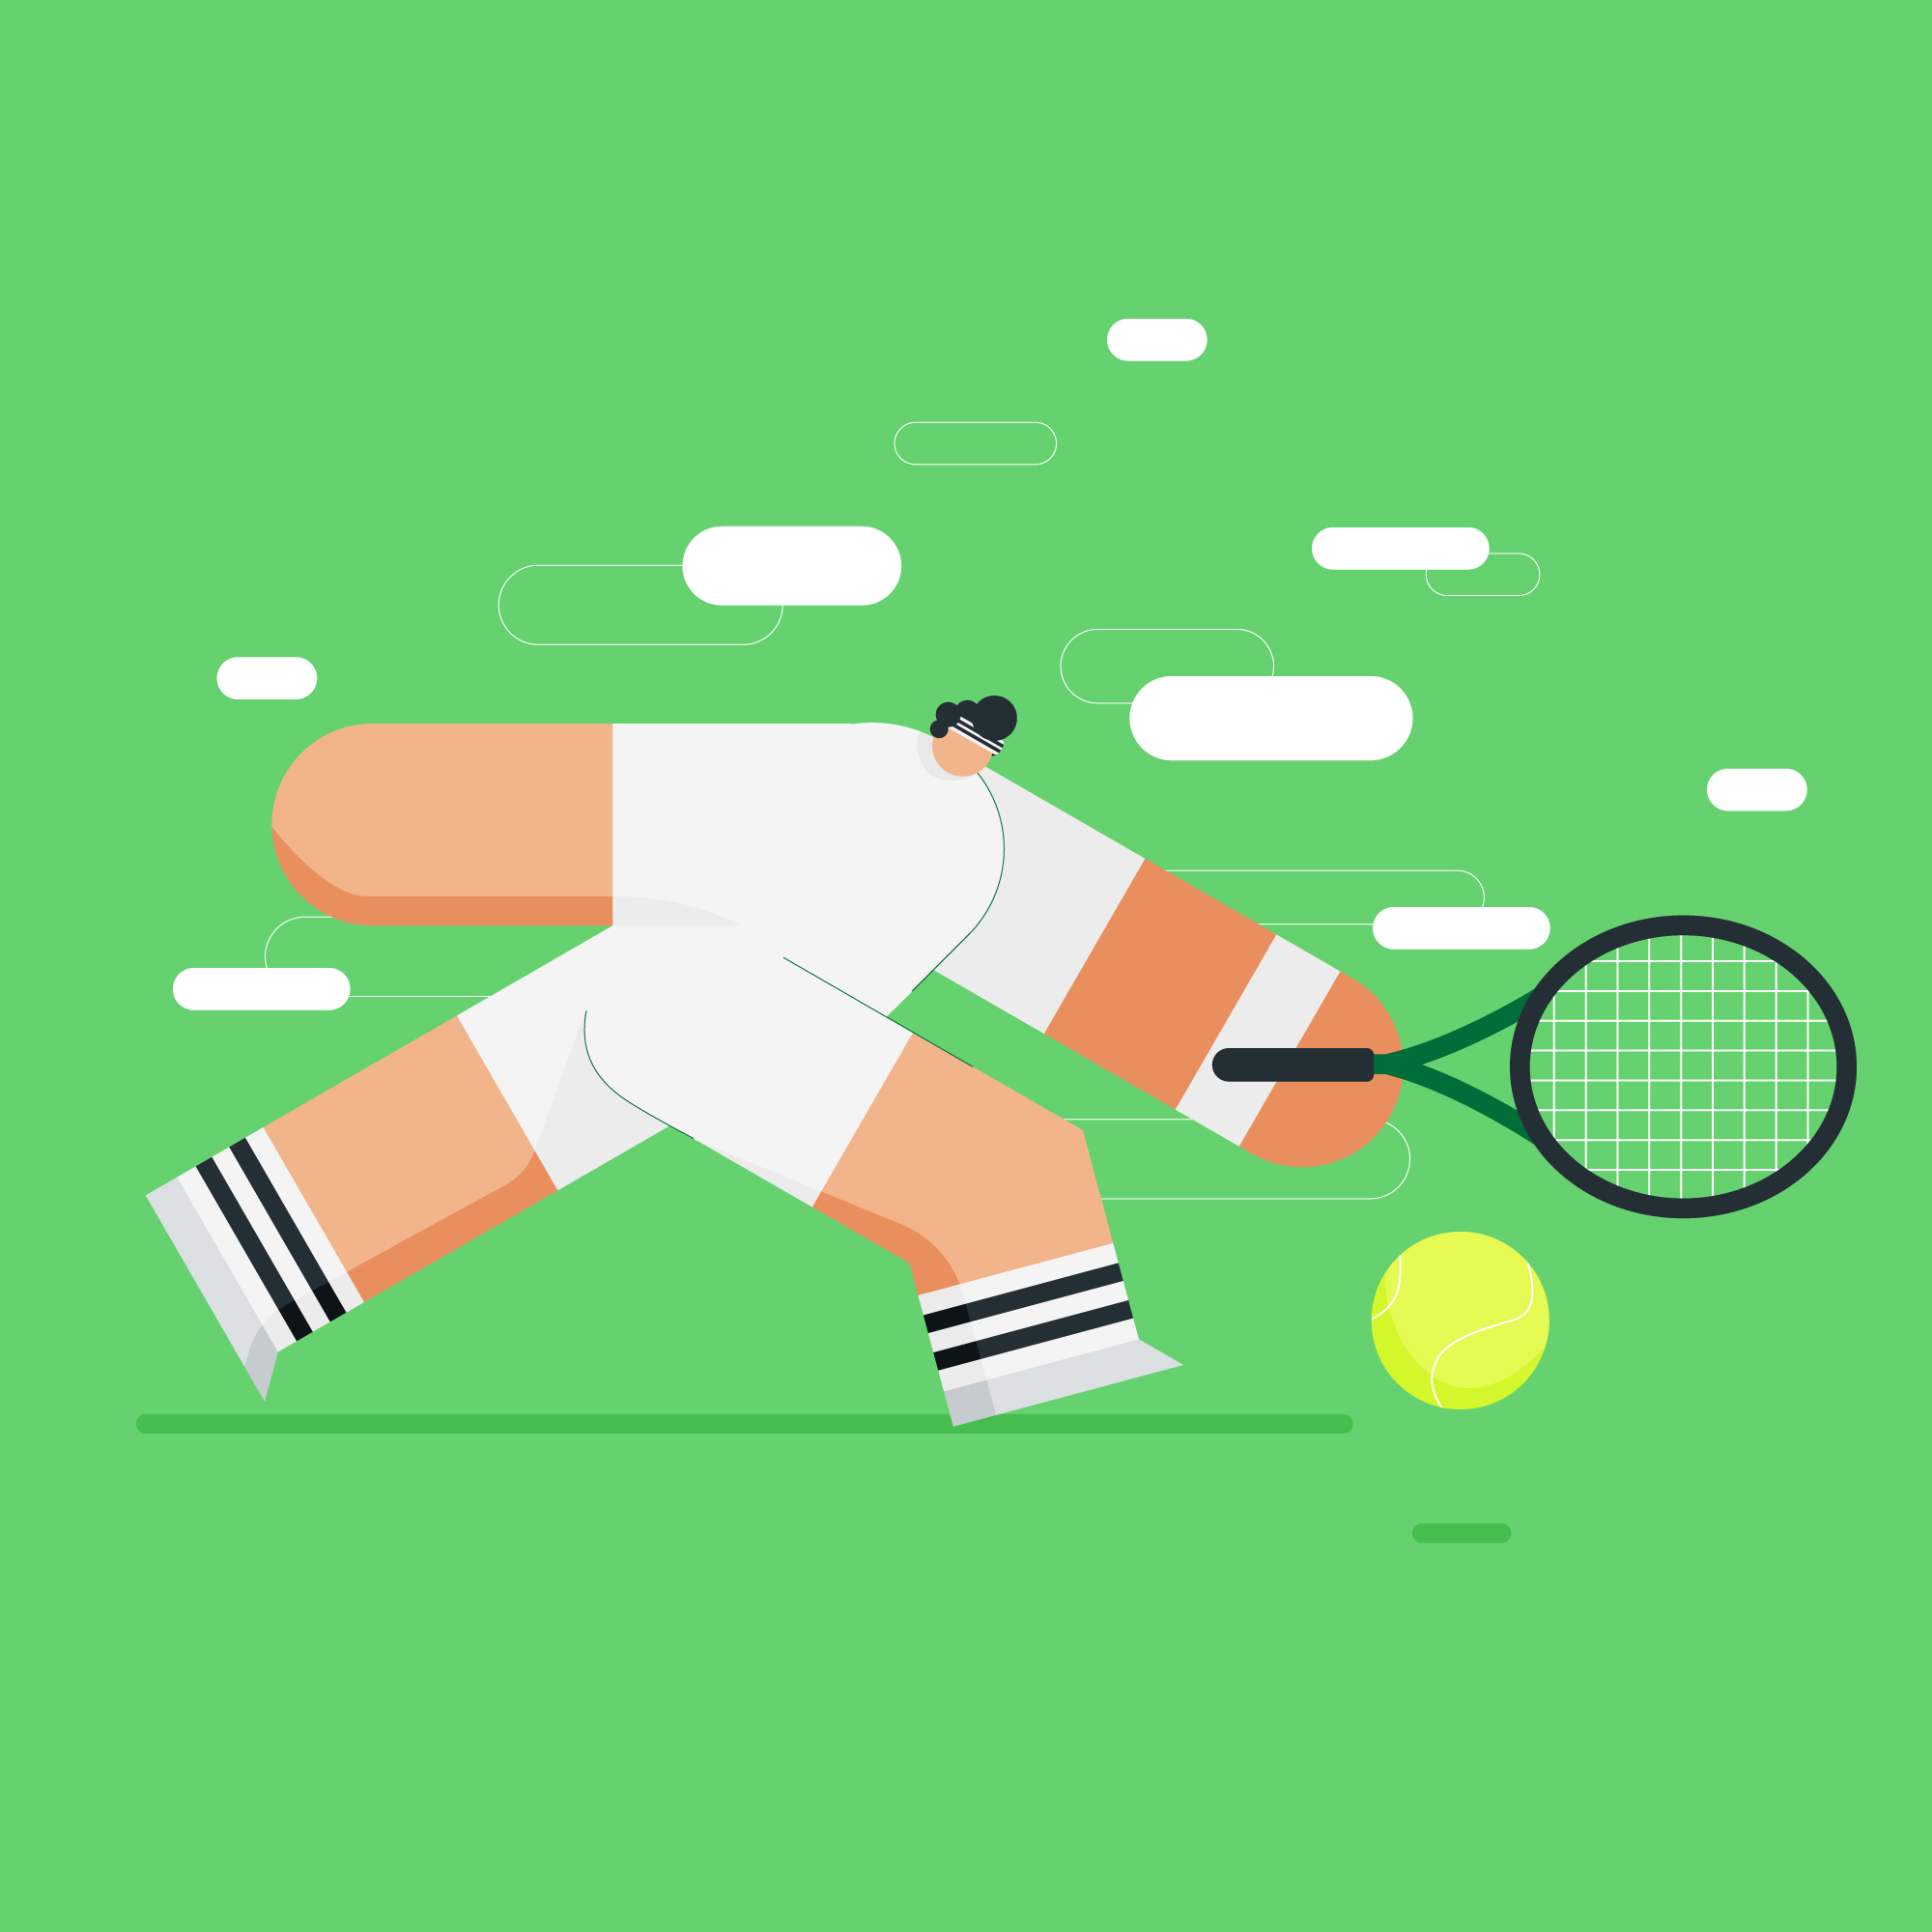 BigBuds_Tennis_Insta.jpg